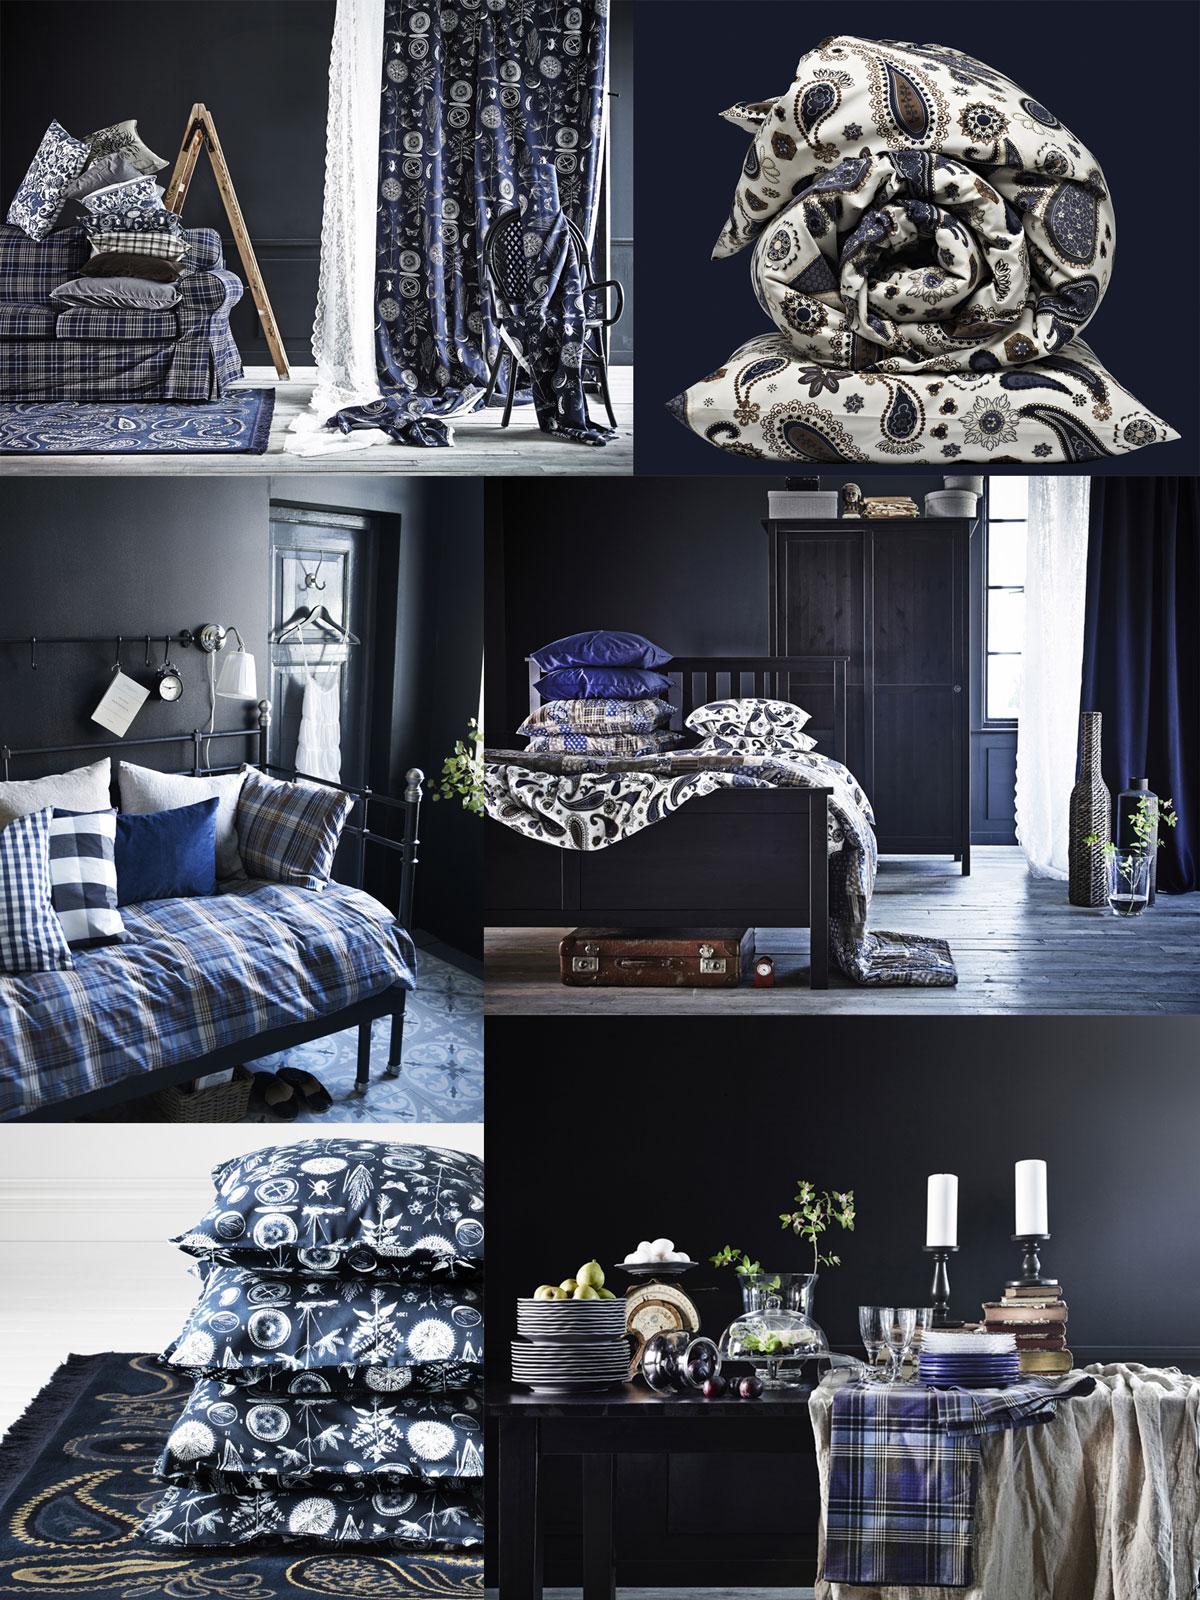 mach mal blau mxliving. Black Bedroom Furniture Sets. Home Design Ideas